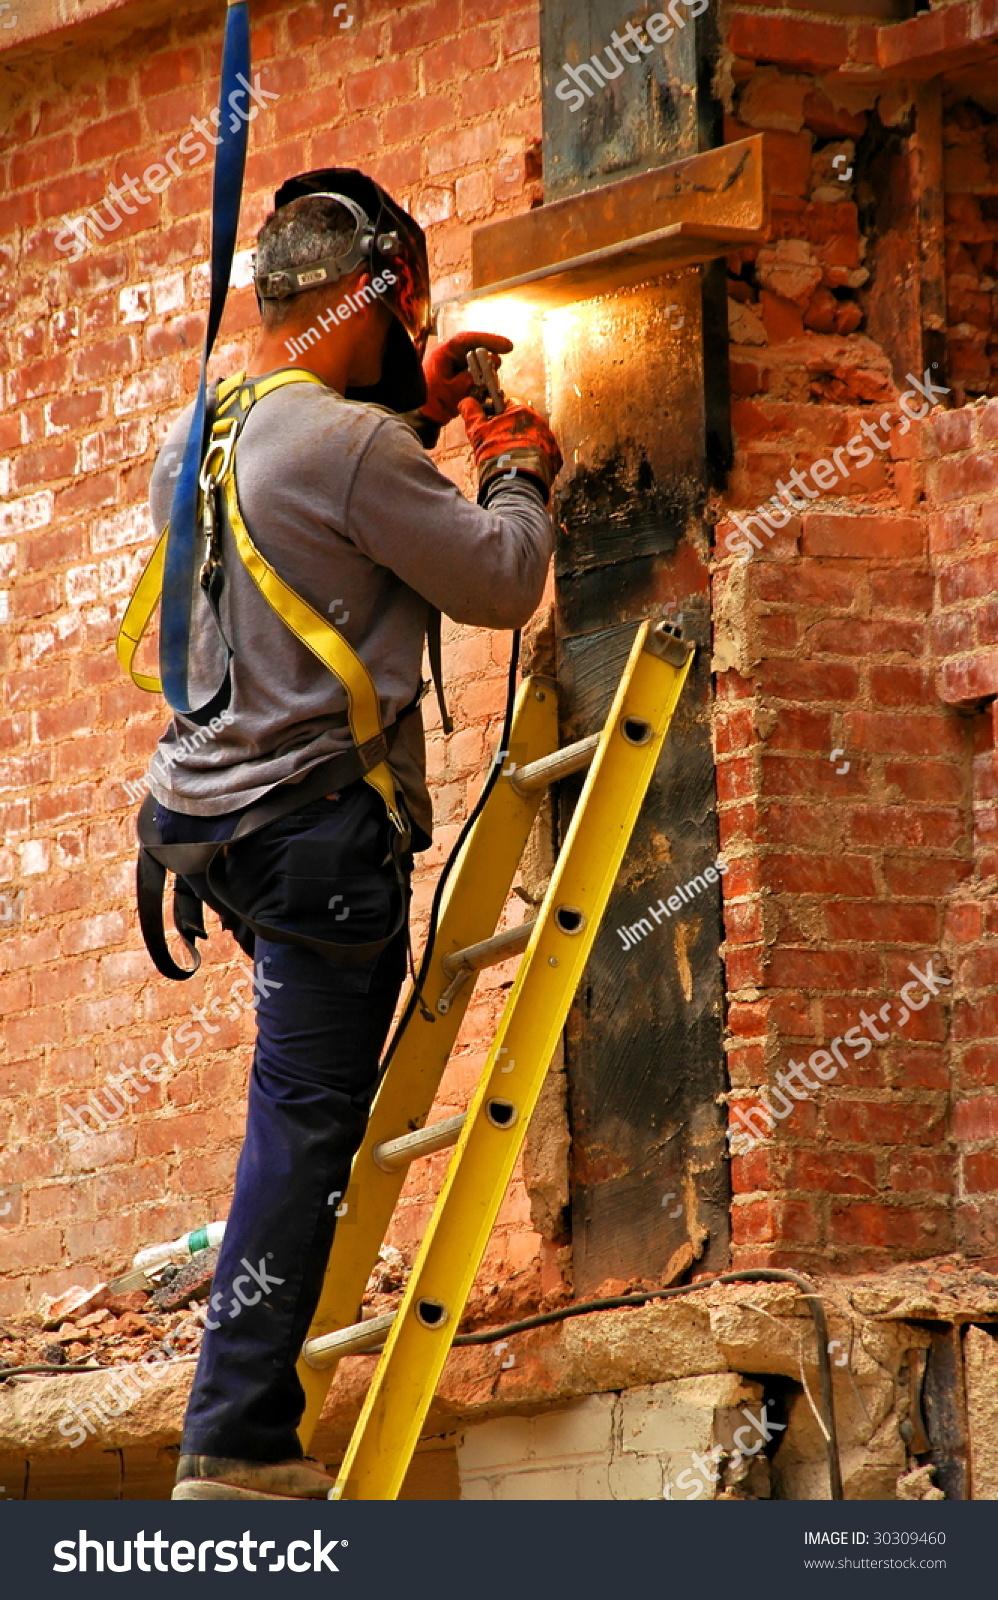 Man Welding Stock Photo 30309460 Shutterstock